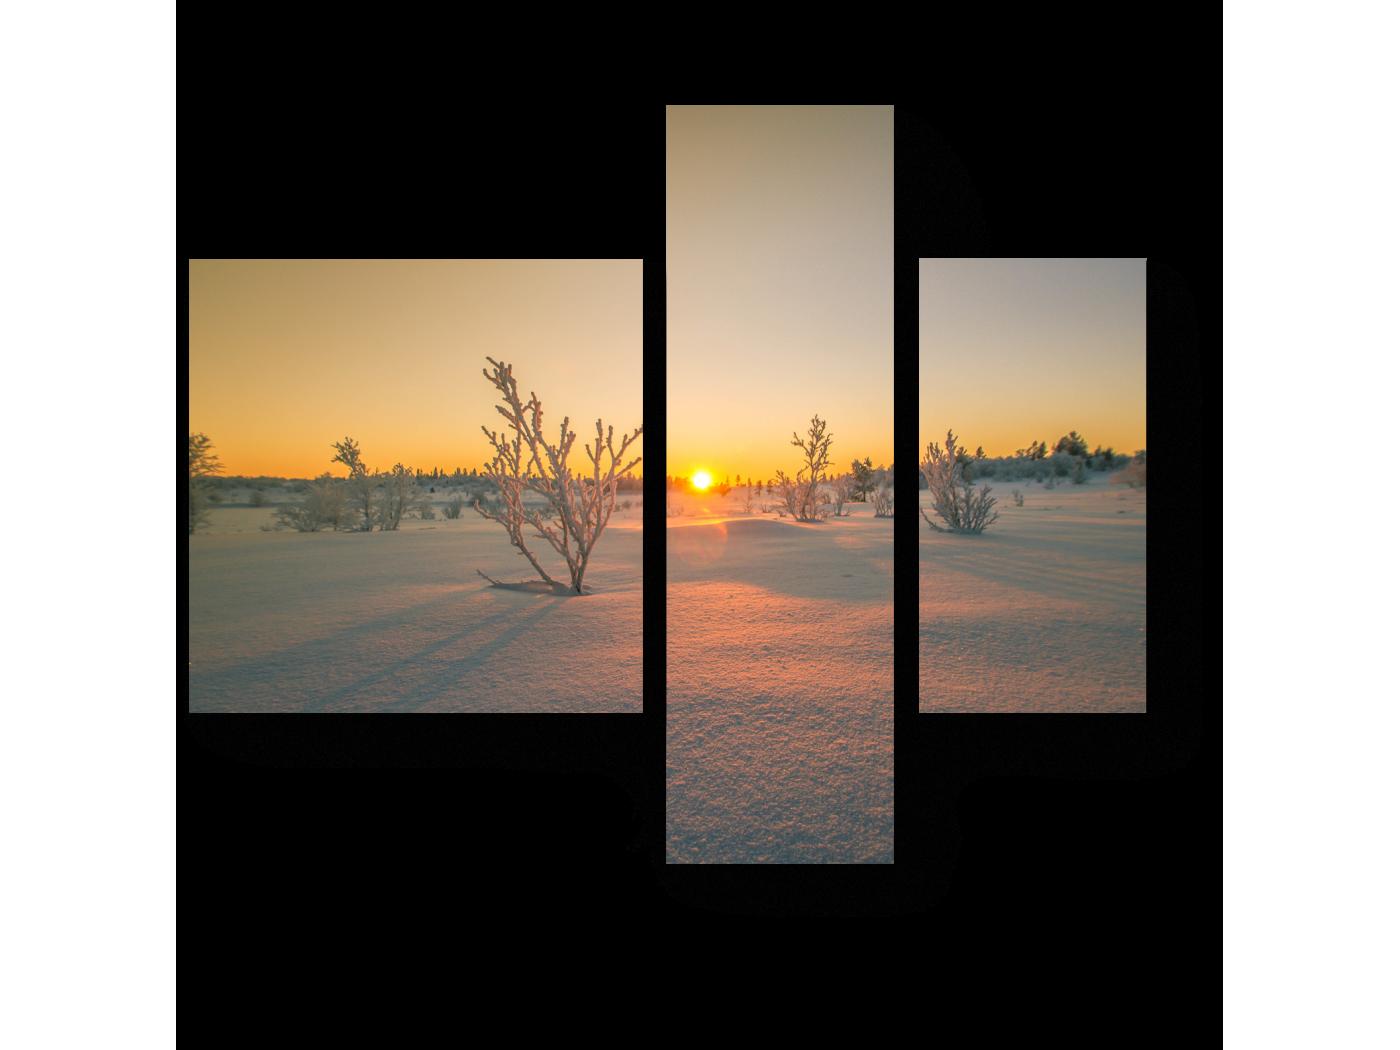 Модульная картина Снежная пустыня (80x66) фото